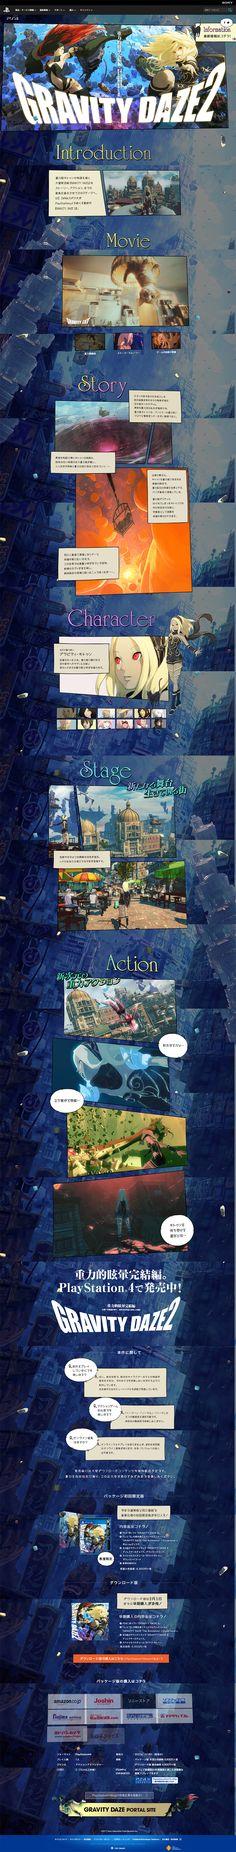 GRAVITY DAZE 2【本・音楽・ゲーム関連】のLPデザイン。WEBデザイナーさん必見!ランディングページのデザイン参考に(アート・芸術系)